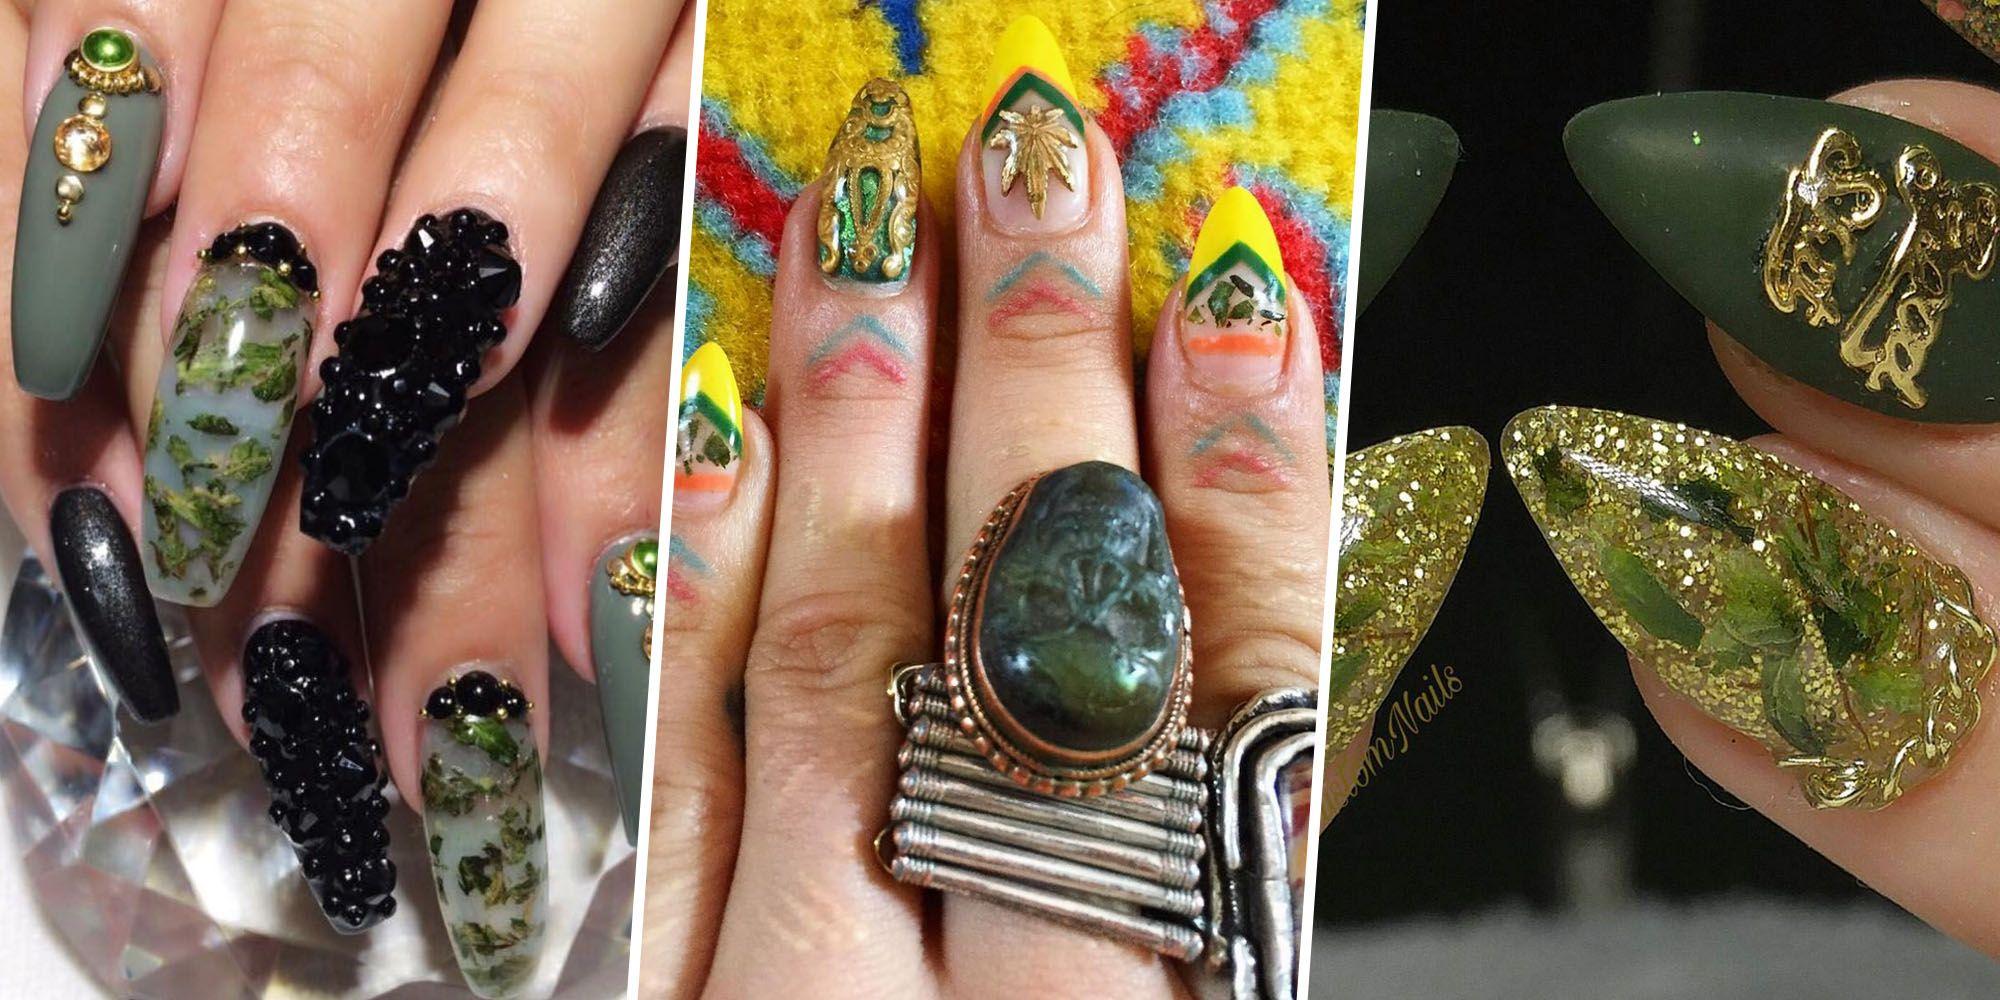 Weed Nails Trend - Marijuana Nail Art